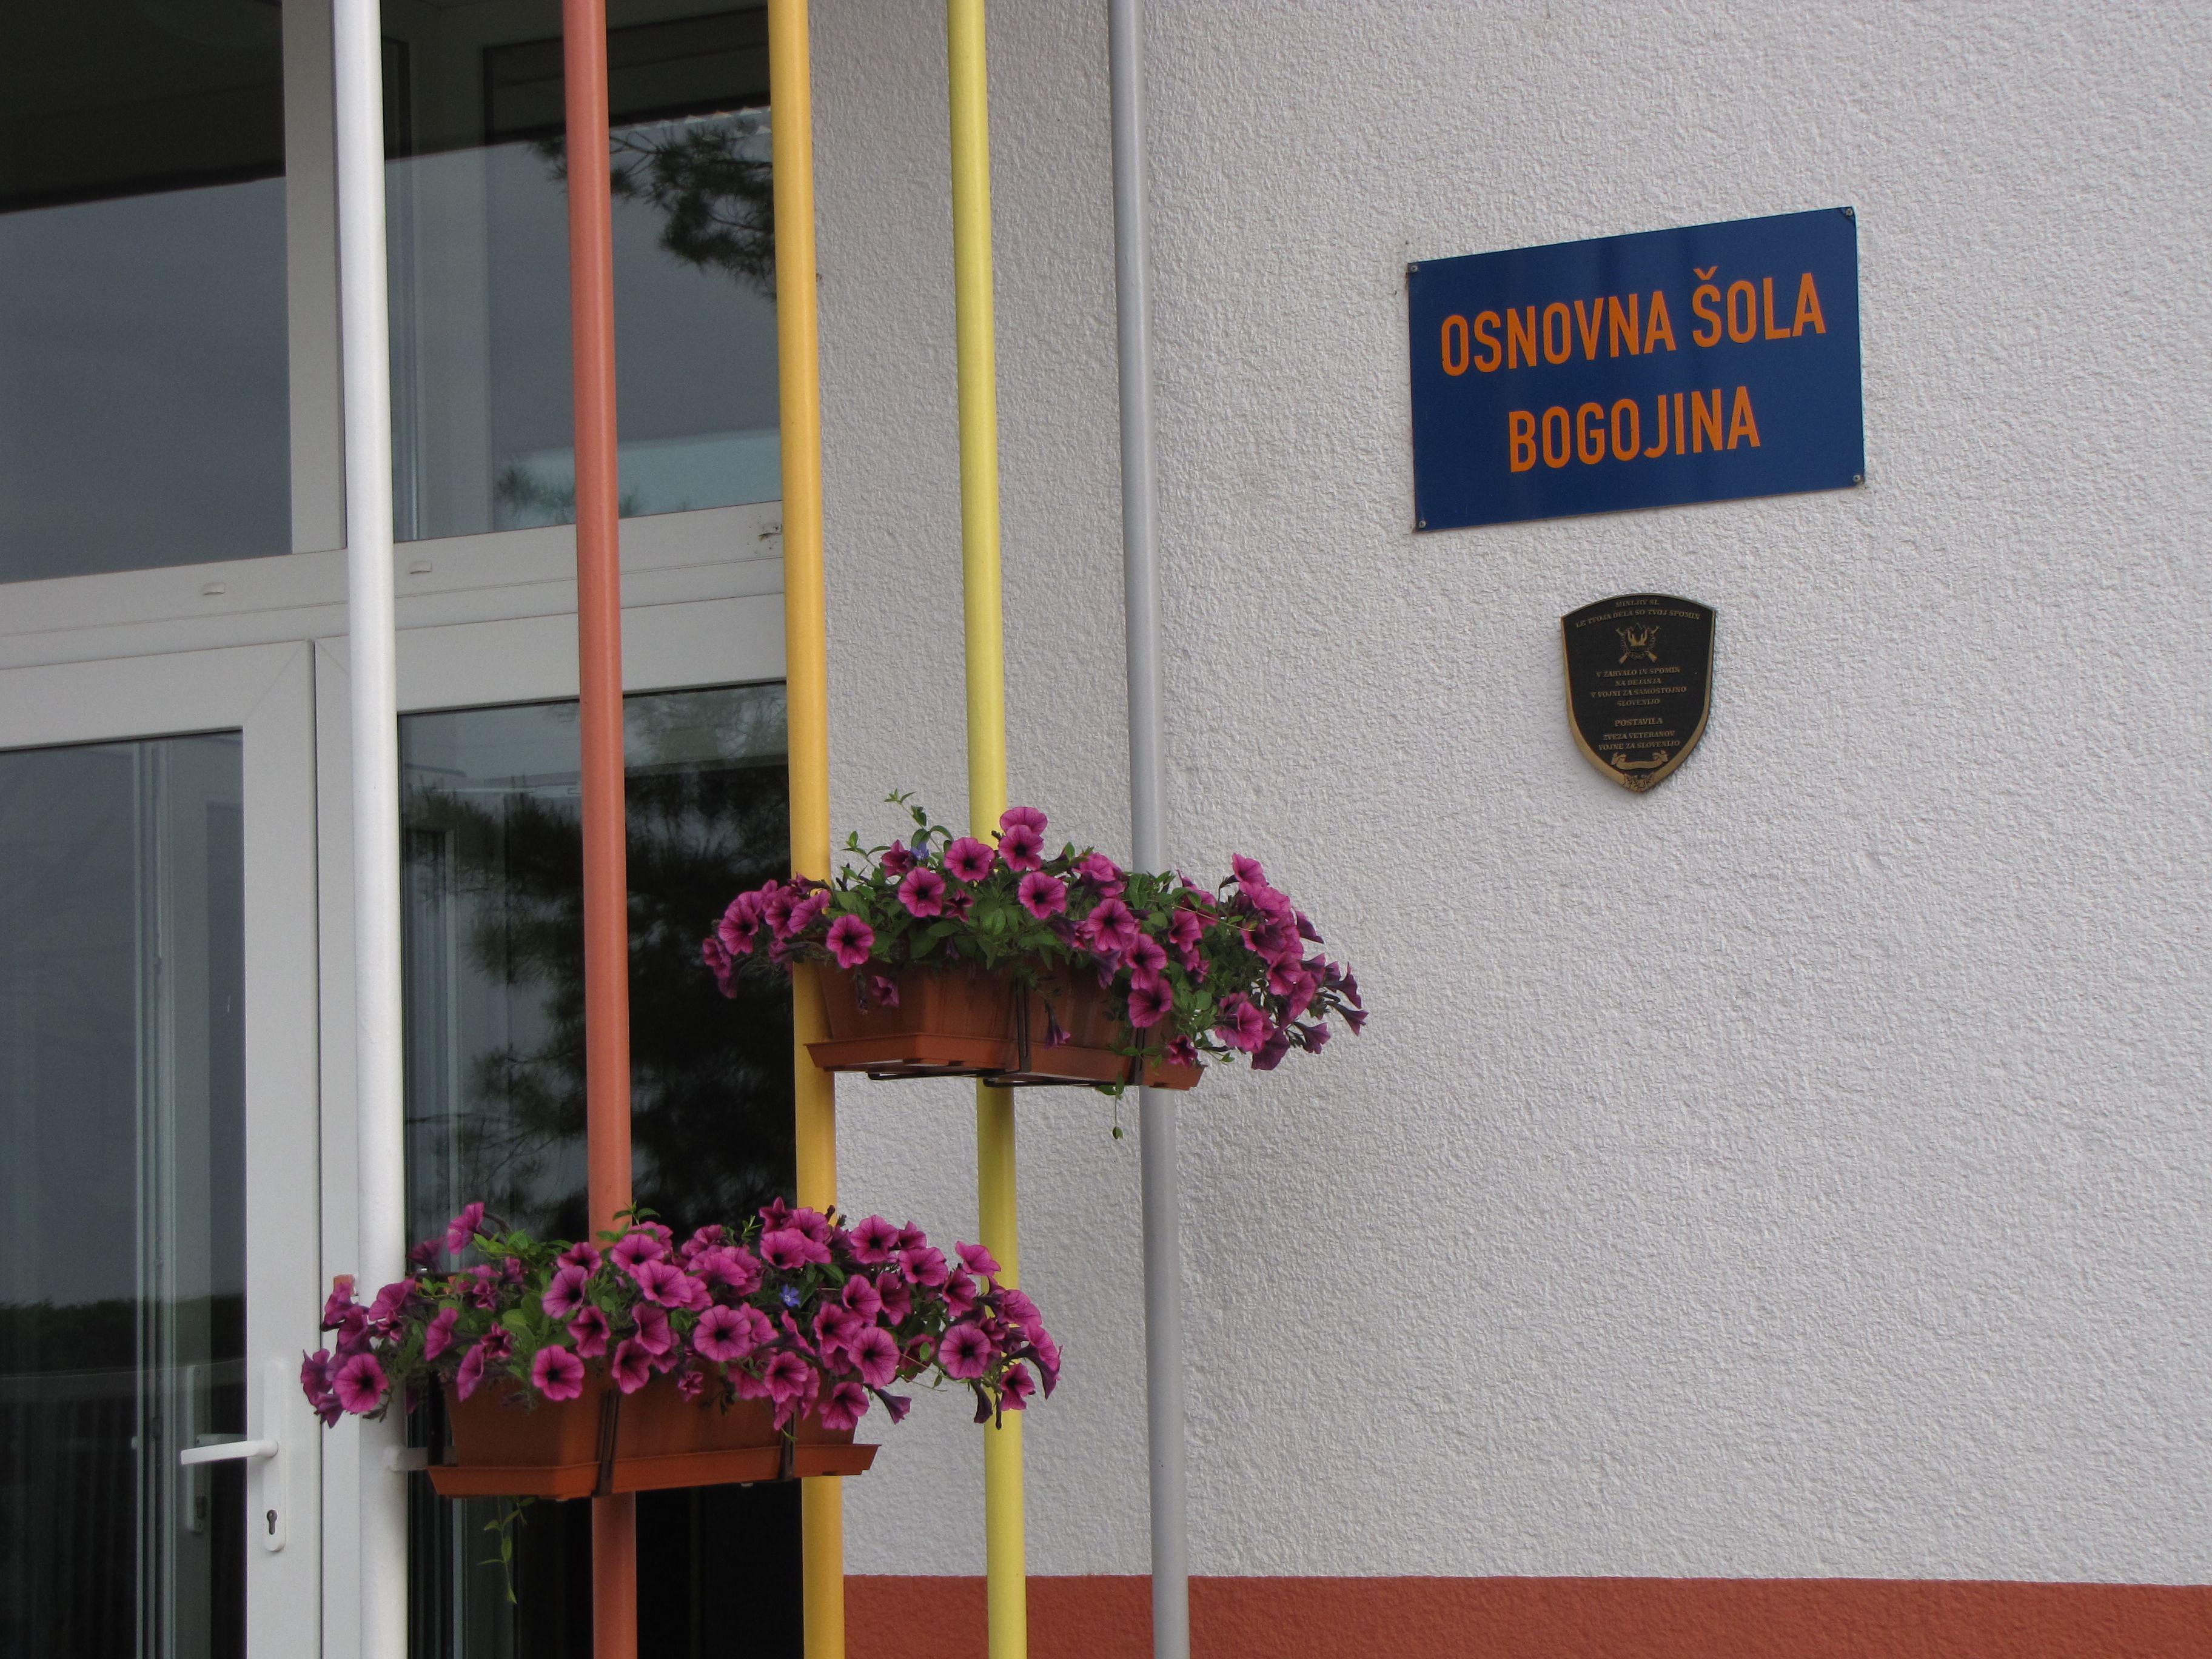 os_bogojina_2011c